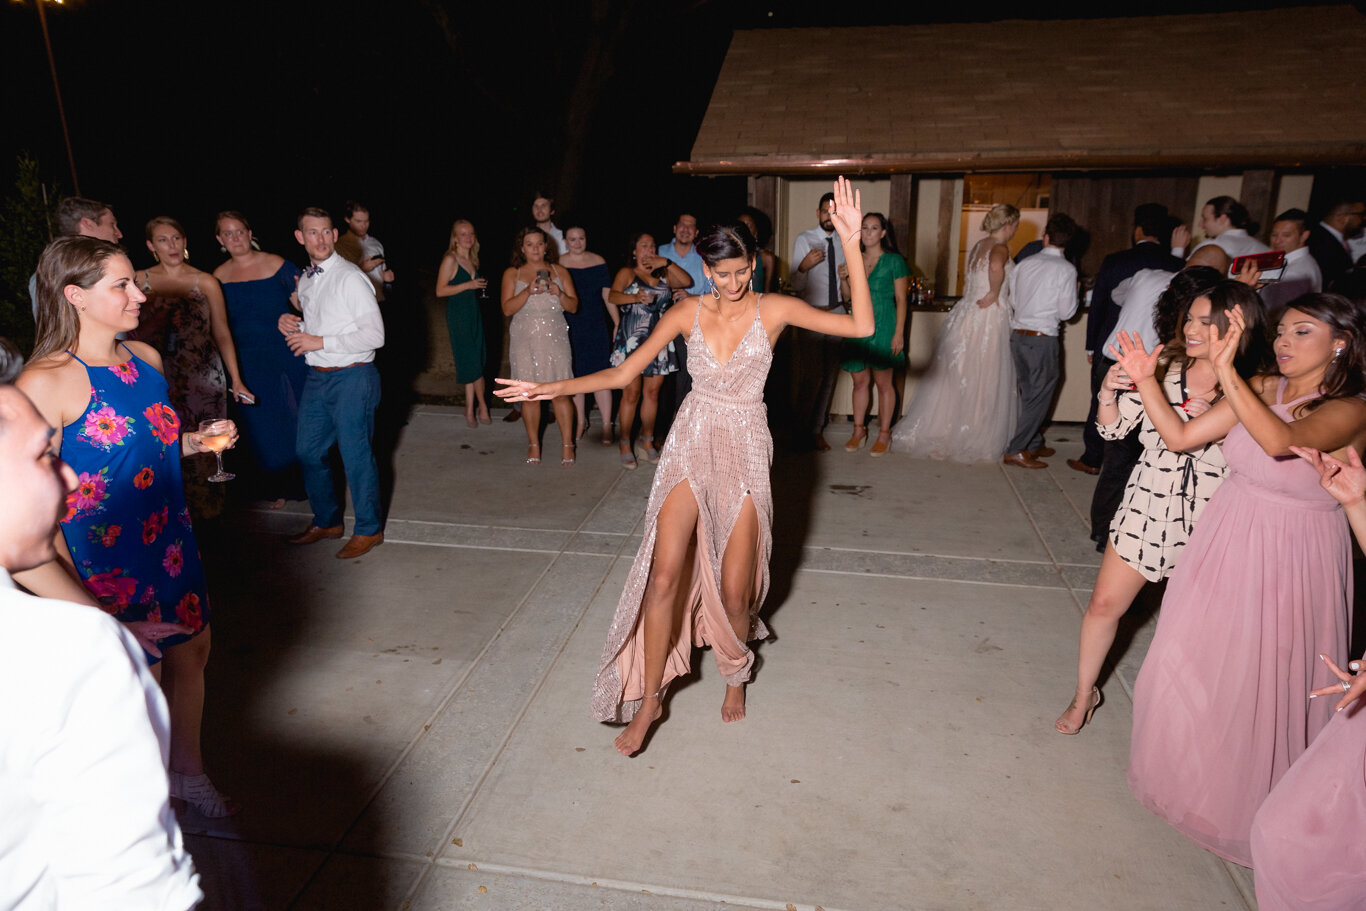 2019.08.24_Emily-Ashir-Wedding-at-the-Maples-6591.jpg